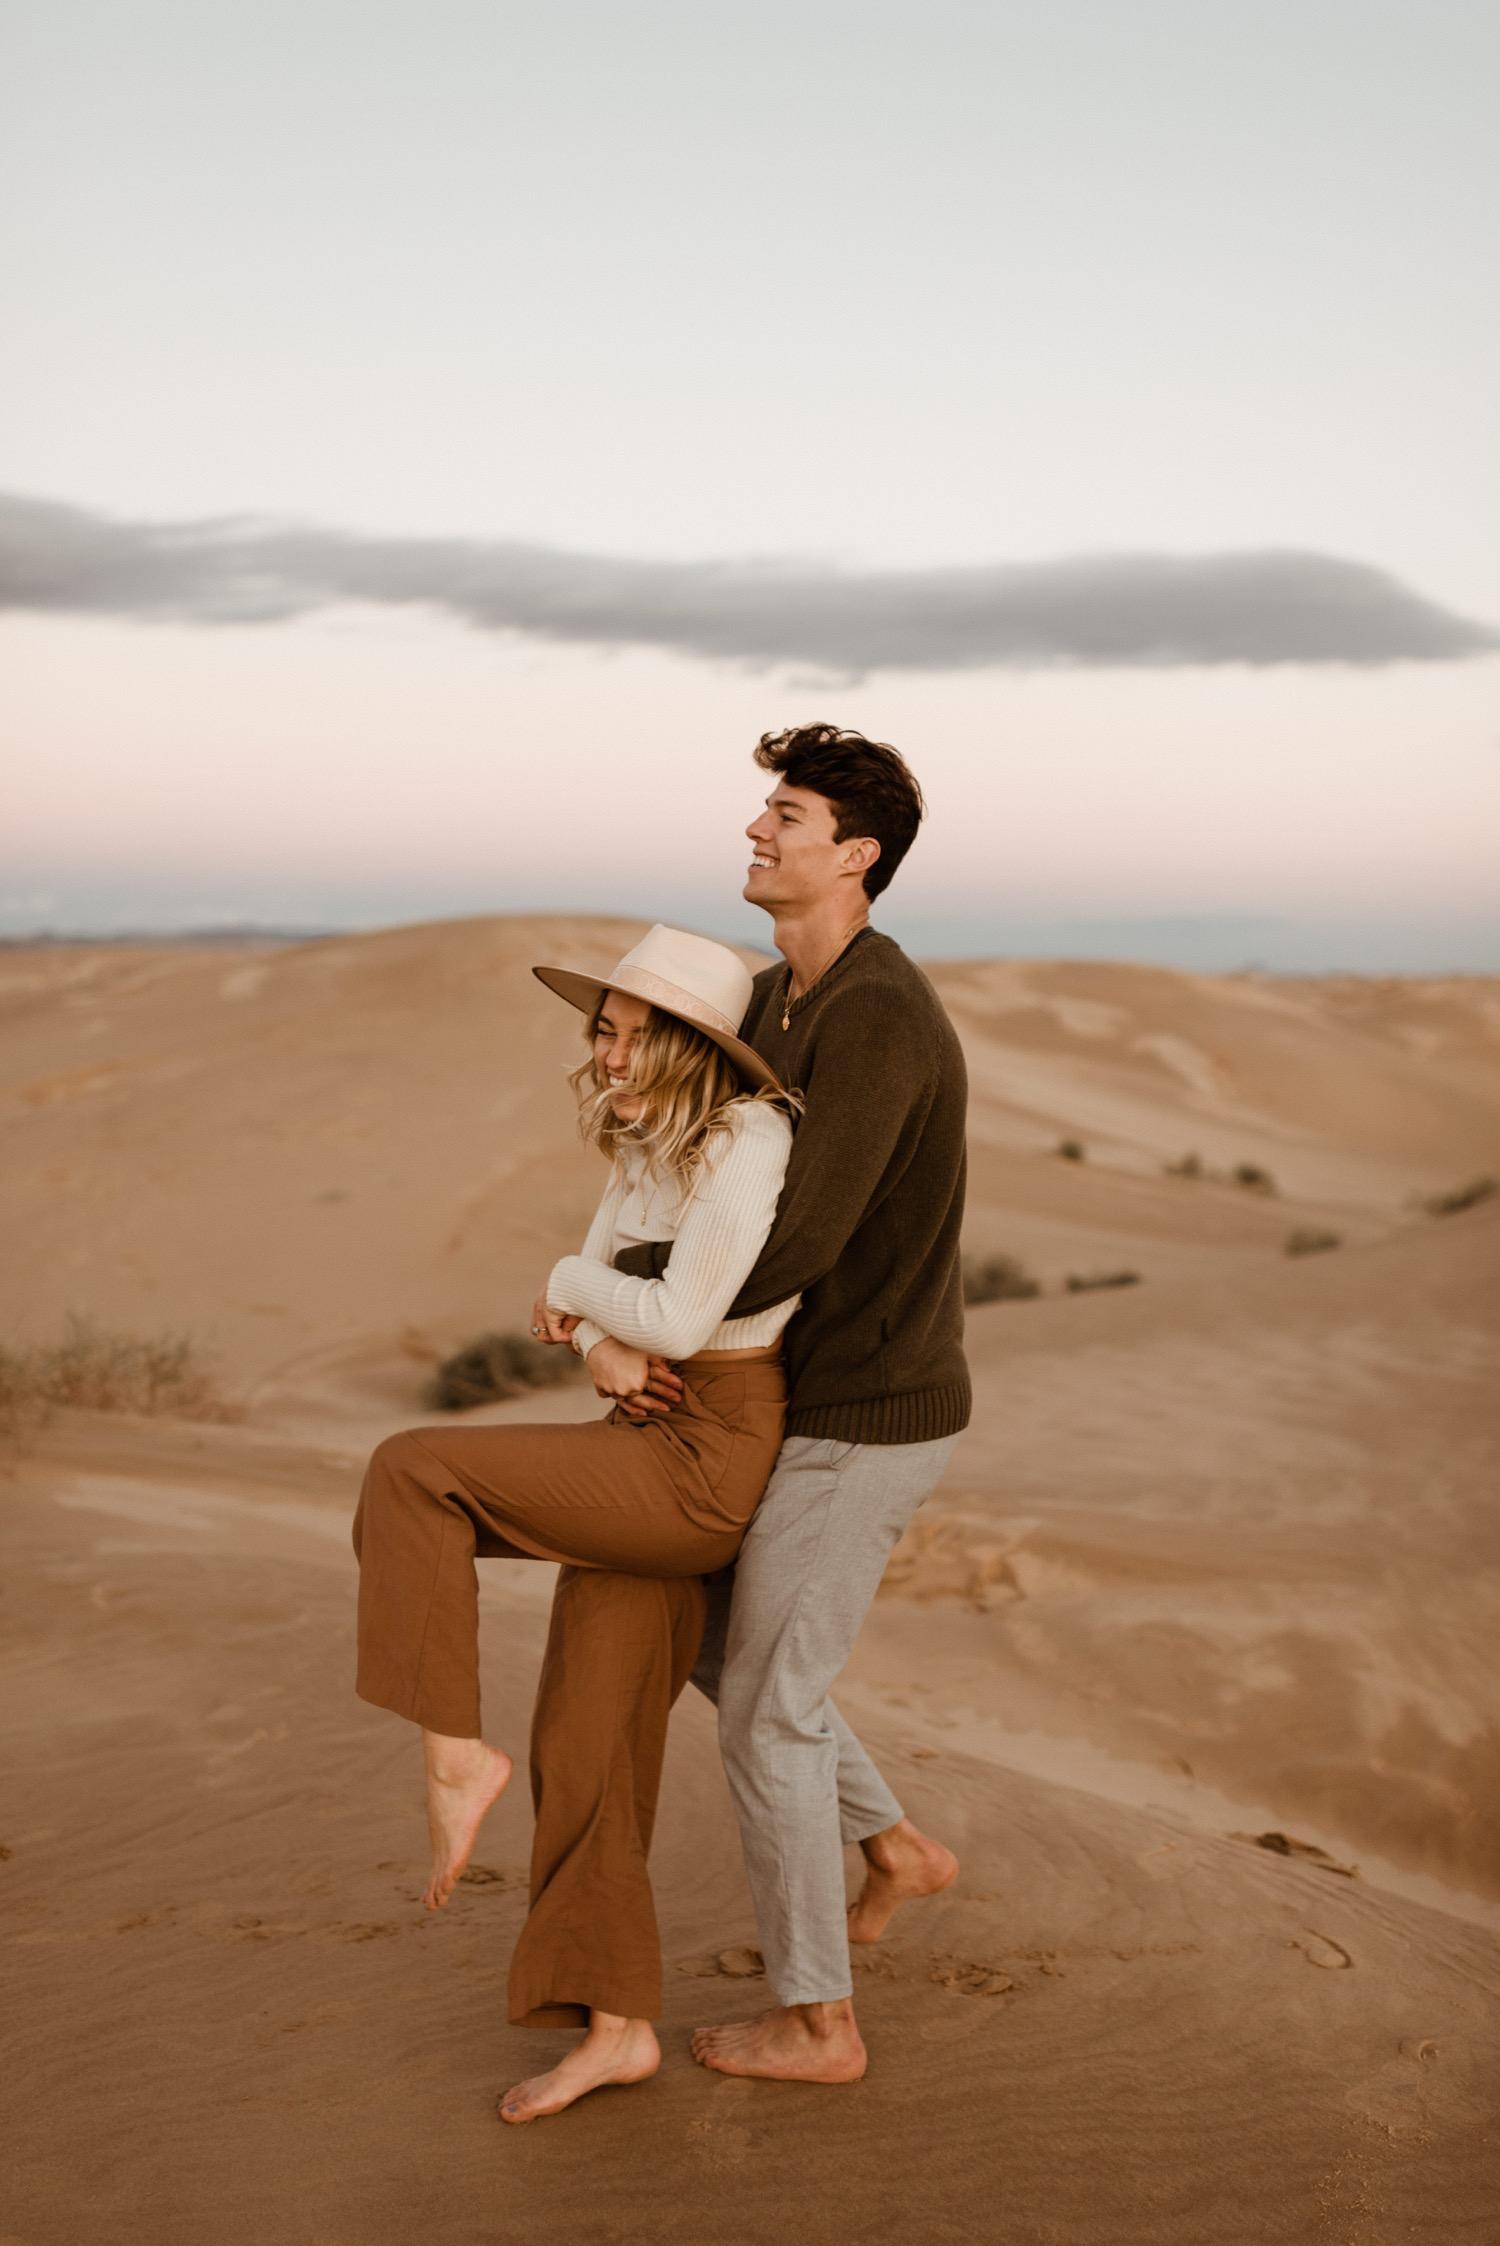 https://content1.getnarrativeapp.com/static/9e8f35c6-5c05-4a14-b41e-14fd5e9e98f9/glamis-Sand-dunes-San-diego-engagement-photos-adventurous-engagement-photos-death-valley-engagement-photos.jpg